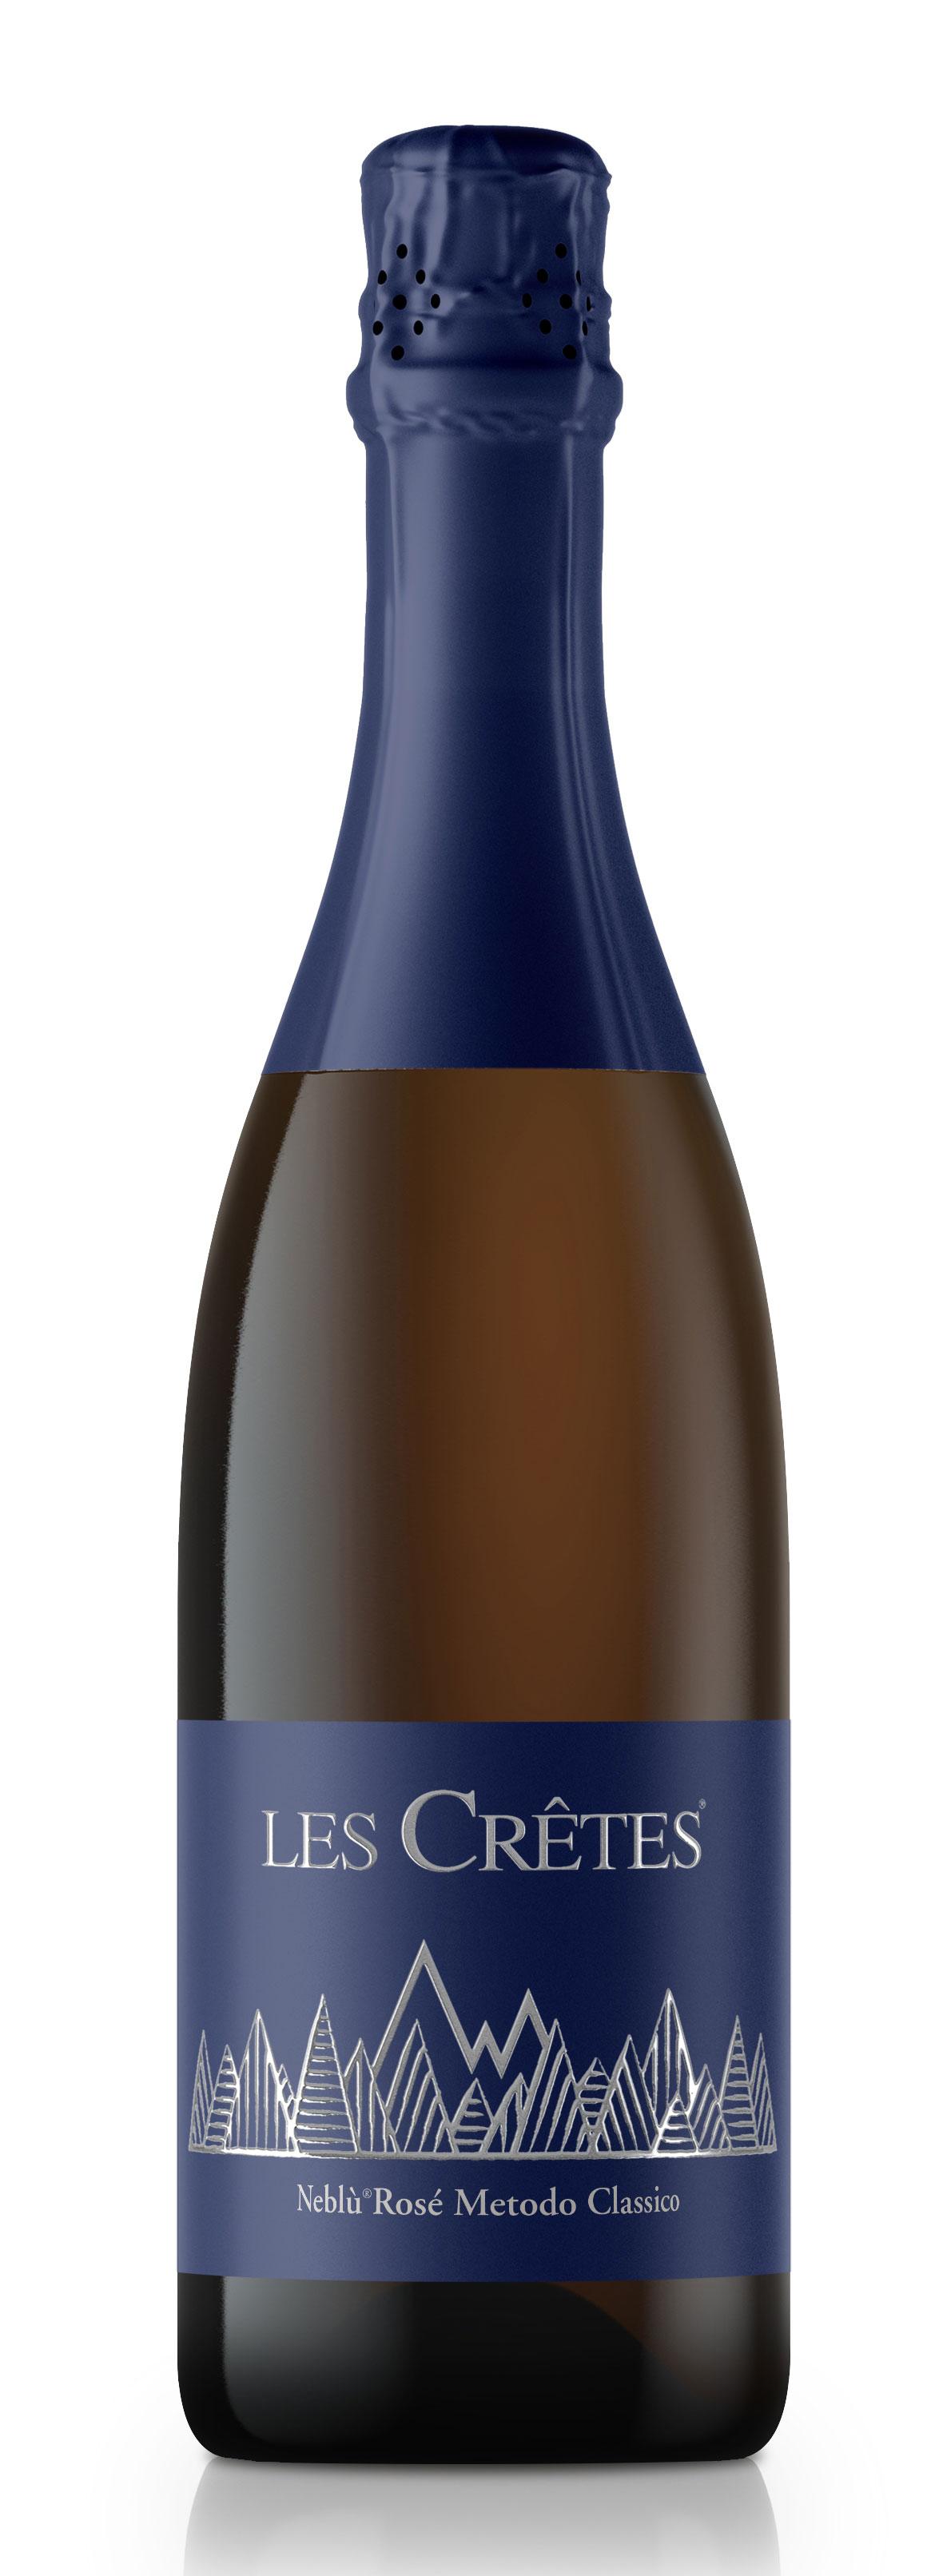 Bollicine Les Crêtes: Neblù Rosé Metodo Classico Vino Spumante Brut